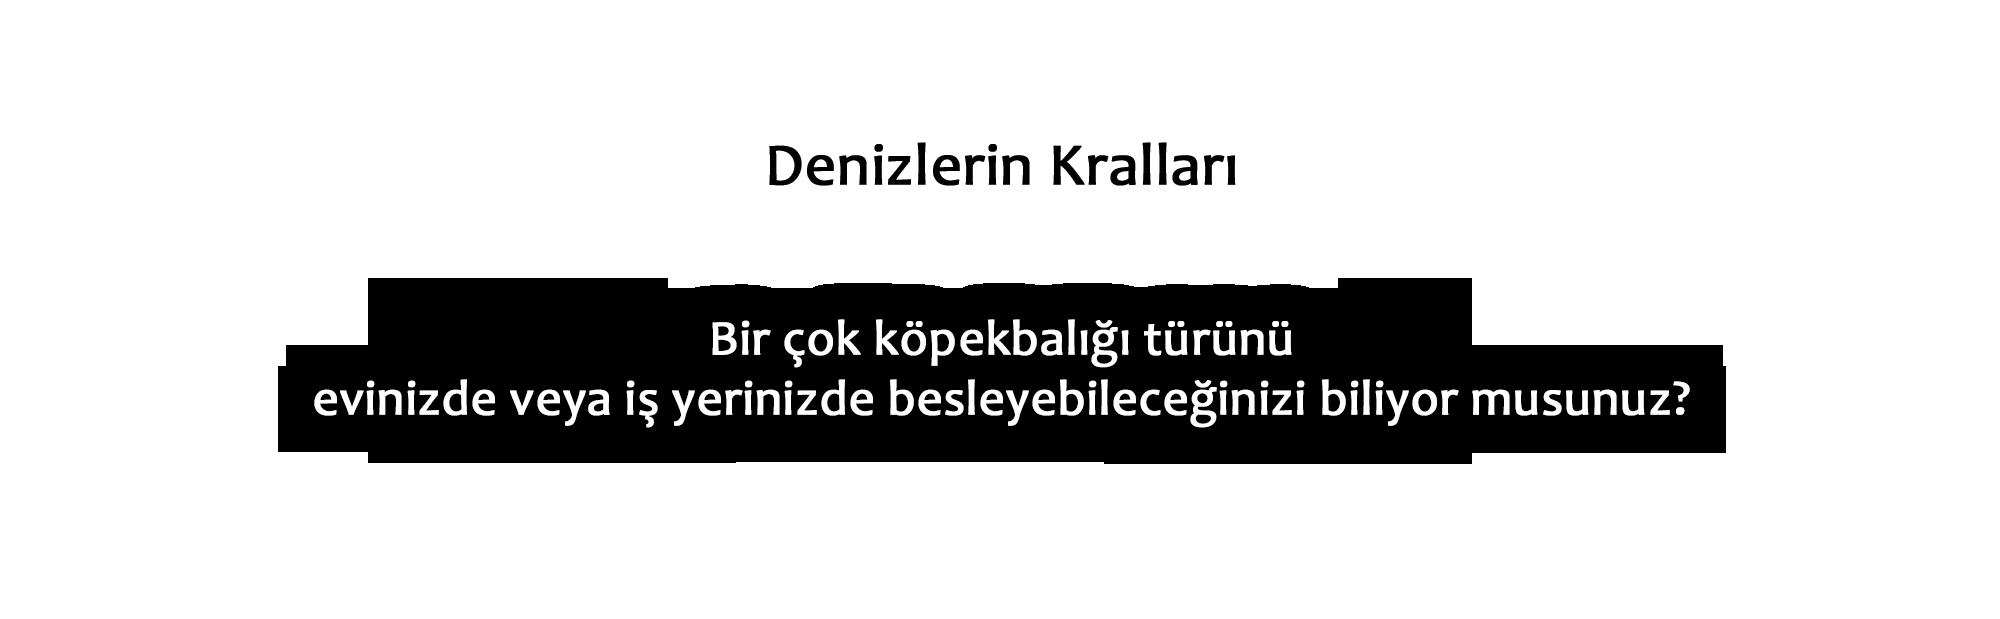 kopek_metin